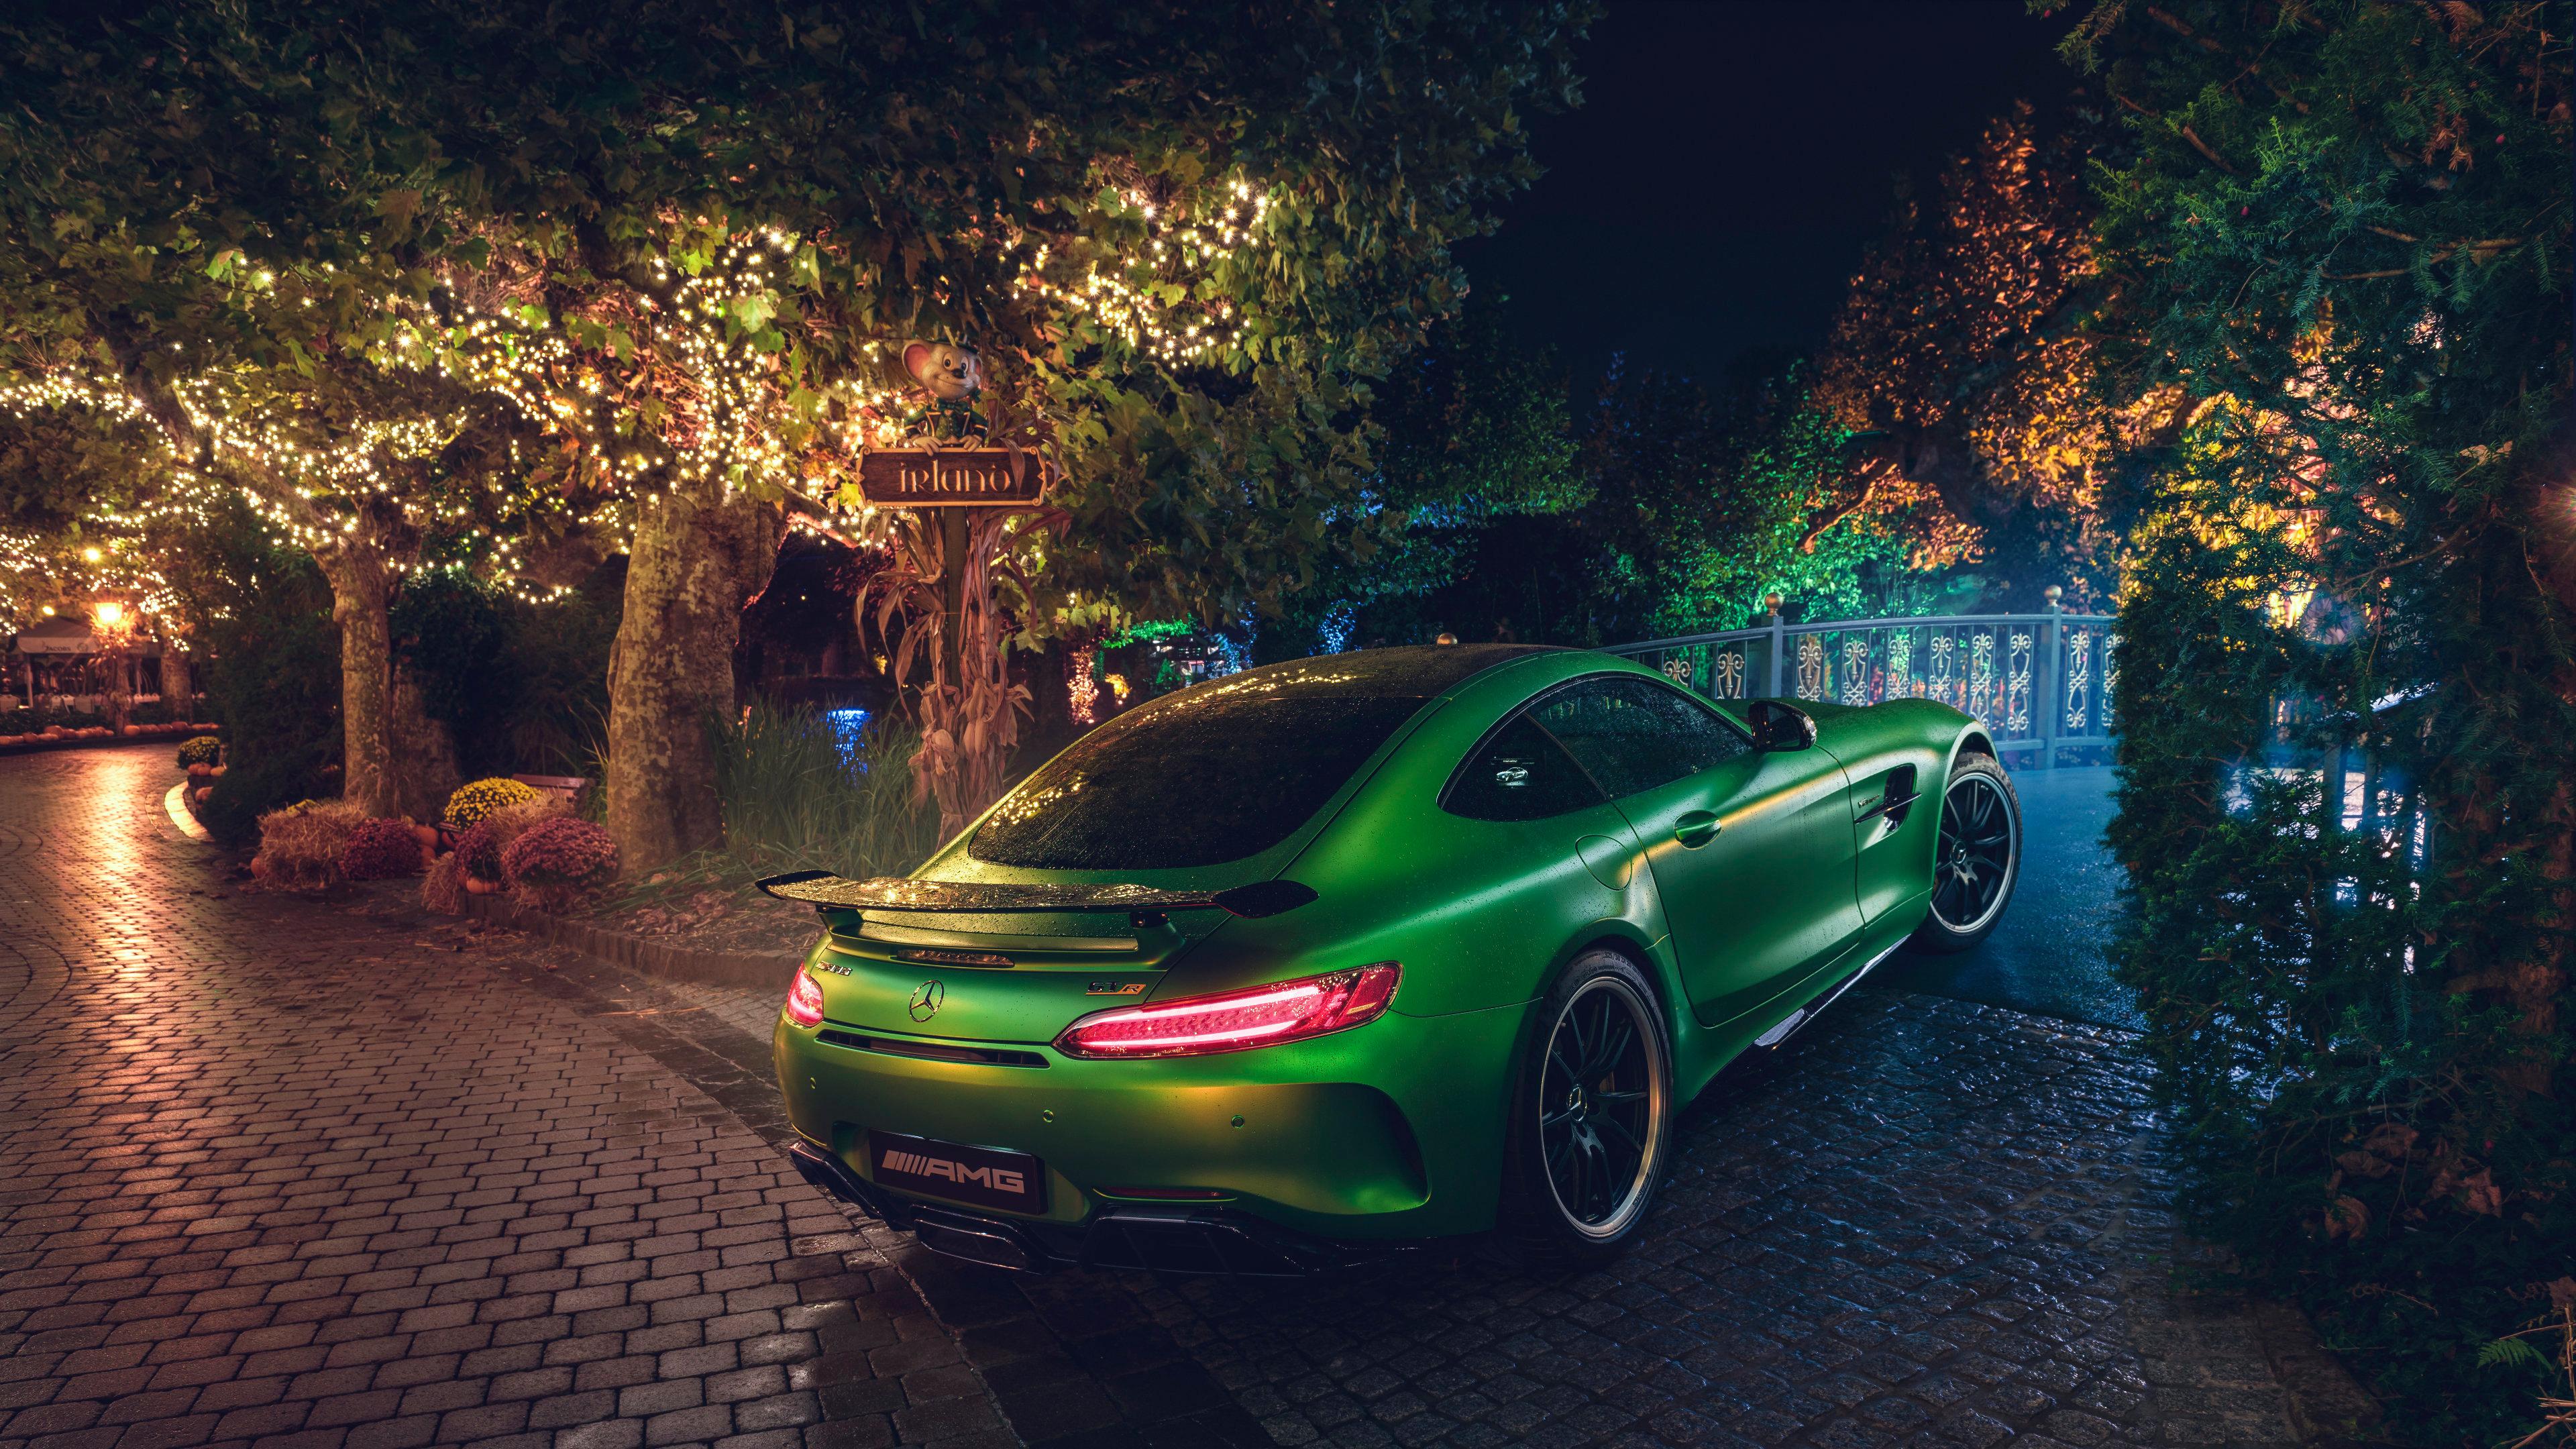 green mercedes amg gt r rear 4k 1546361640 - Green Mercedes AMG GT R Rear 4k - mercedes wallpapers, mercedes amg gtr wallpapers, hd-wallpapers, cars wallpapers, 4k-wallpapers, 2018 cars wallpapers